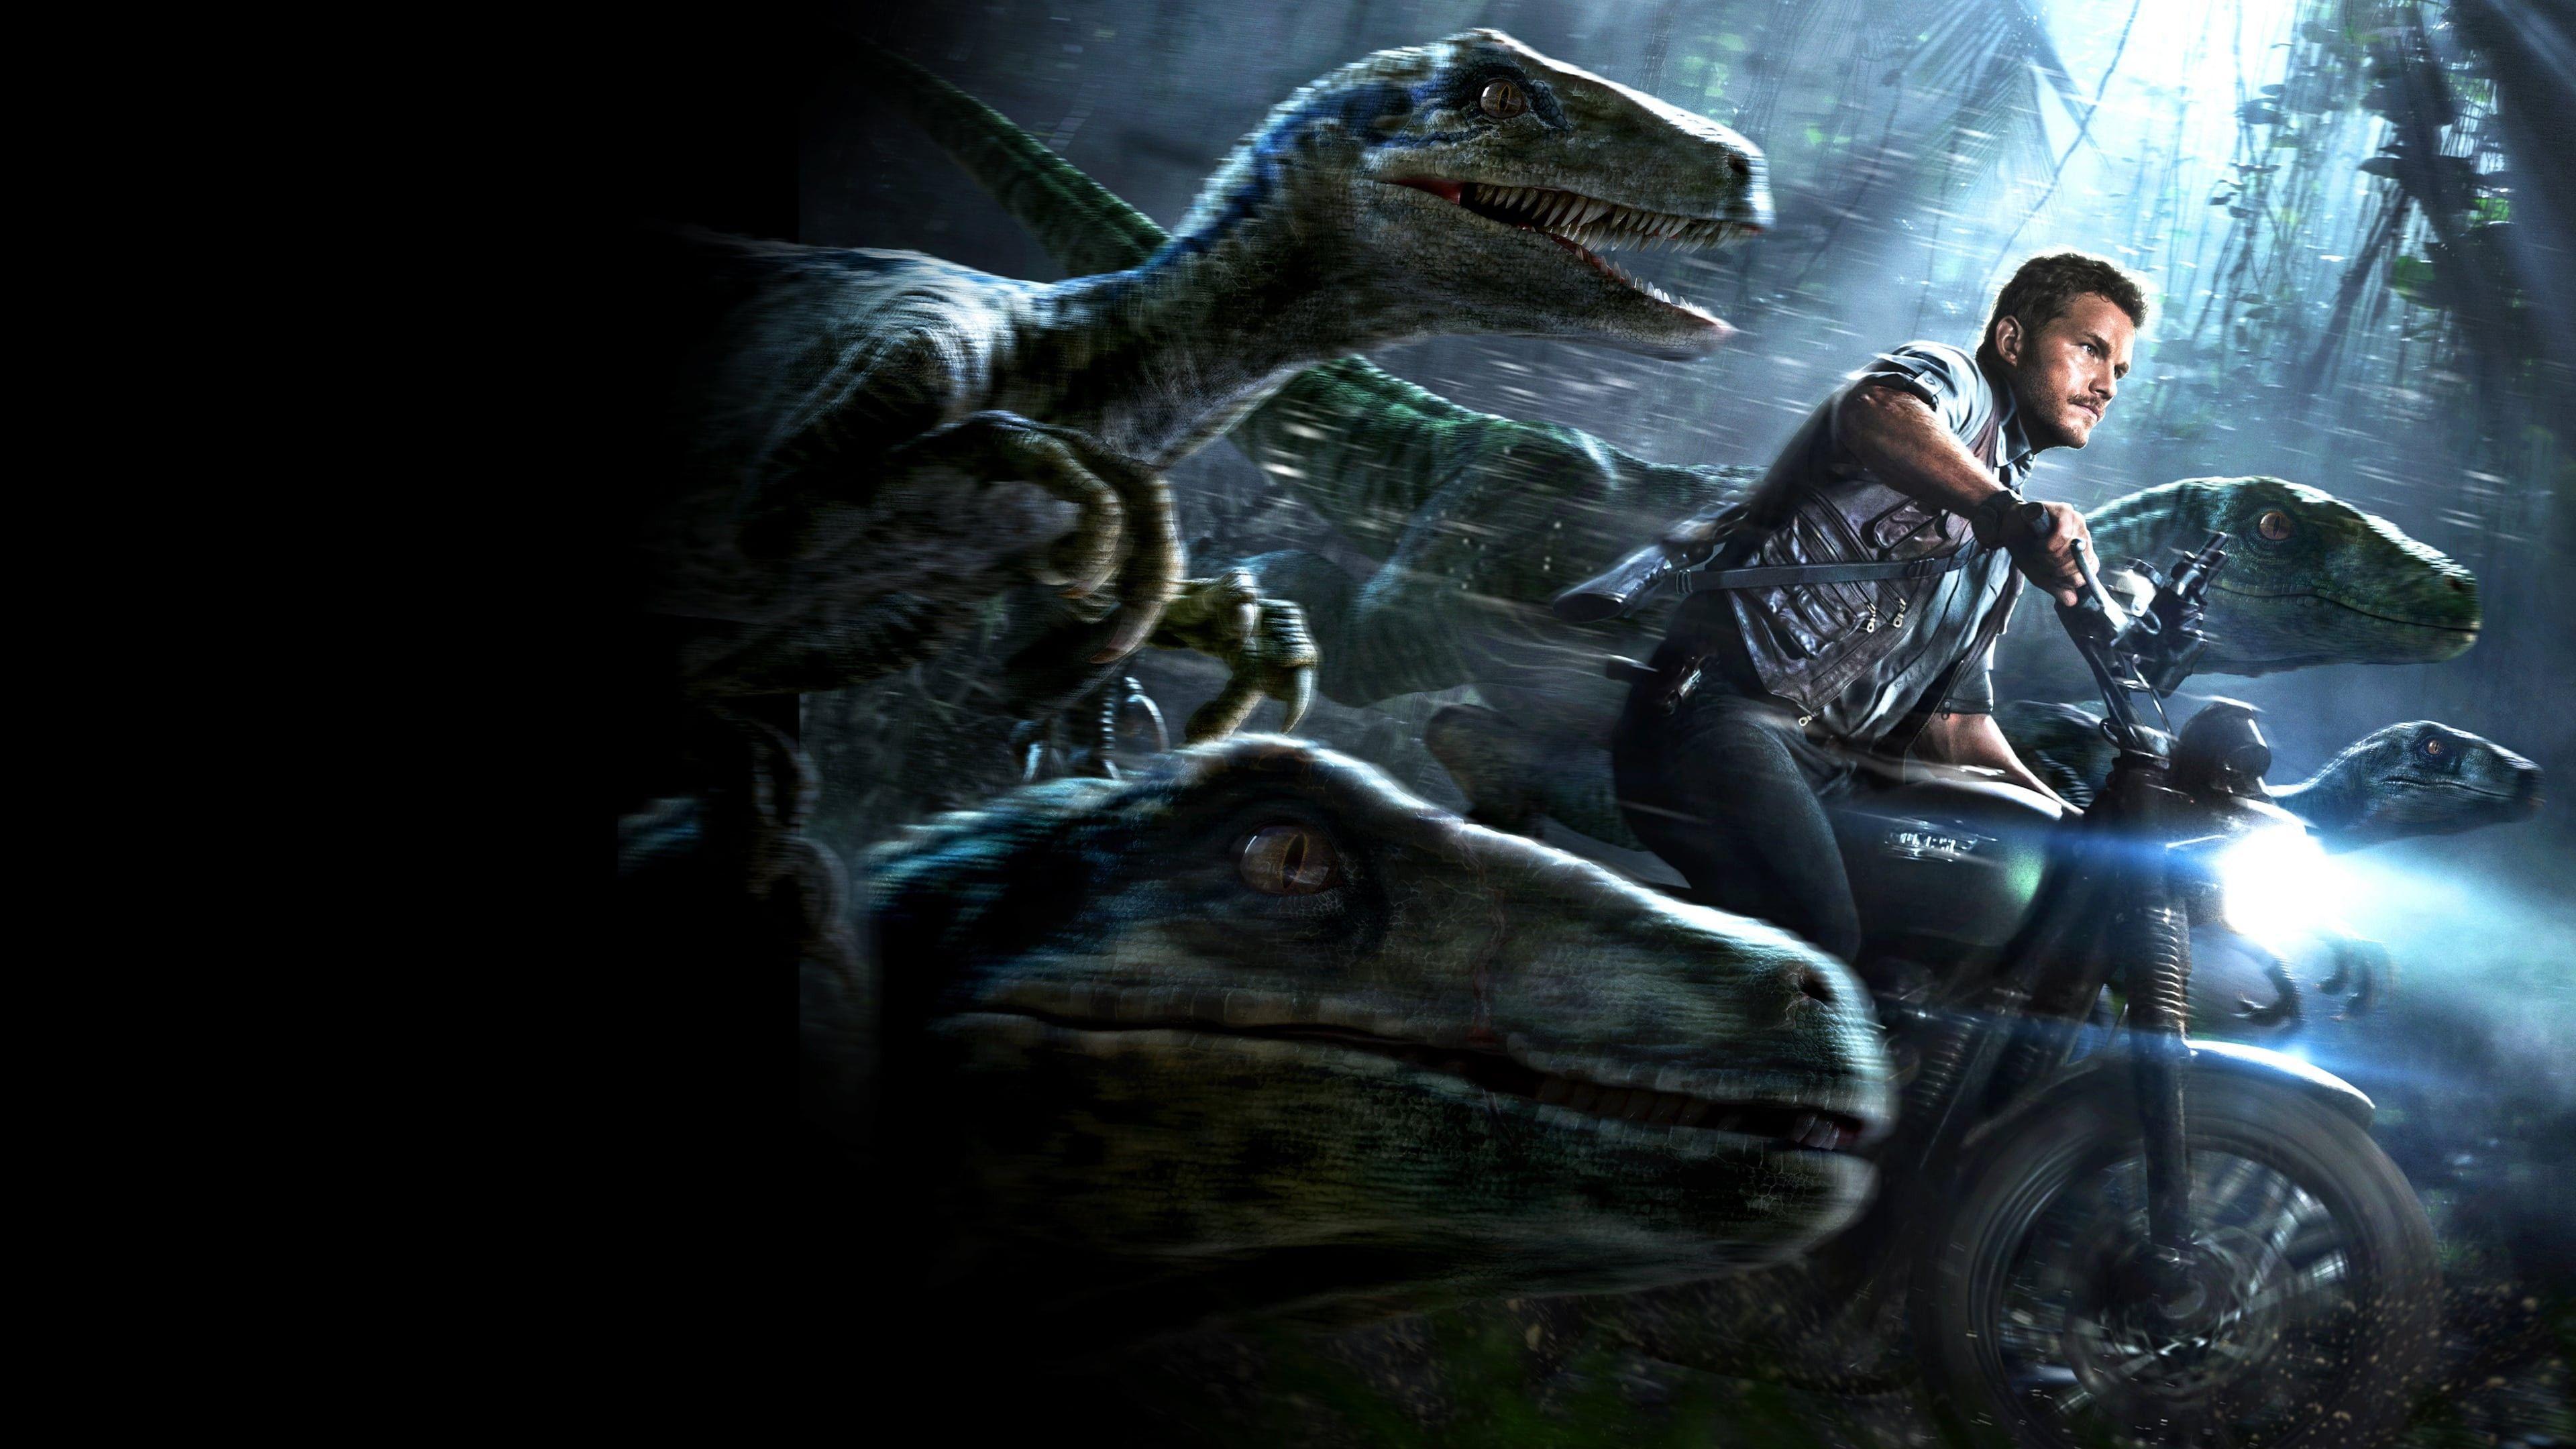 Jurassic World 4K Wallpapers - Top Free Jurassic World 4K ...